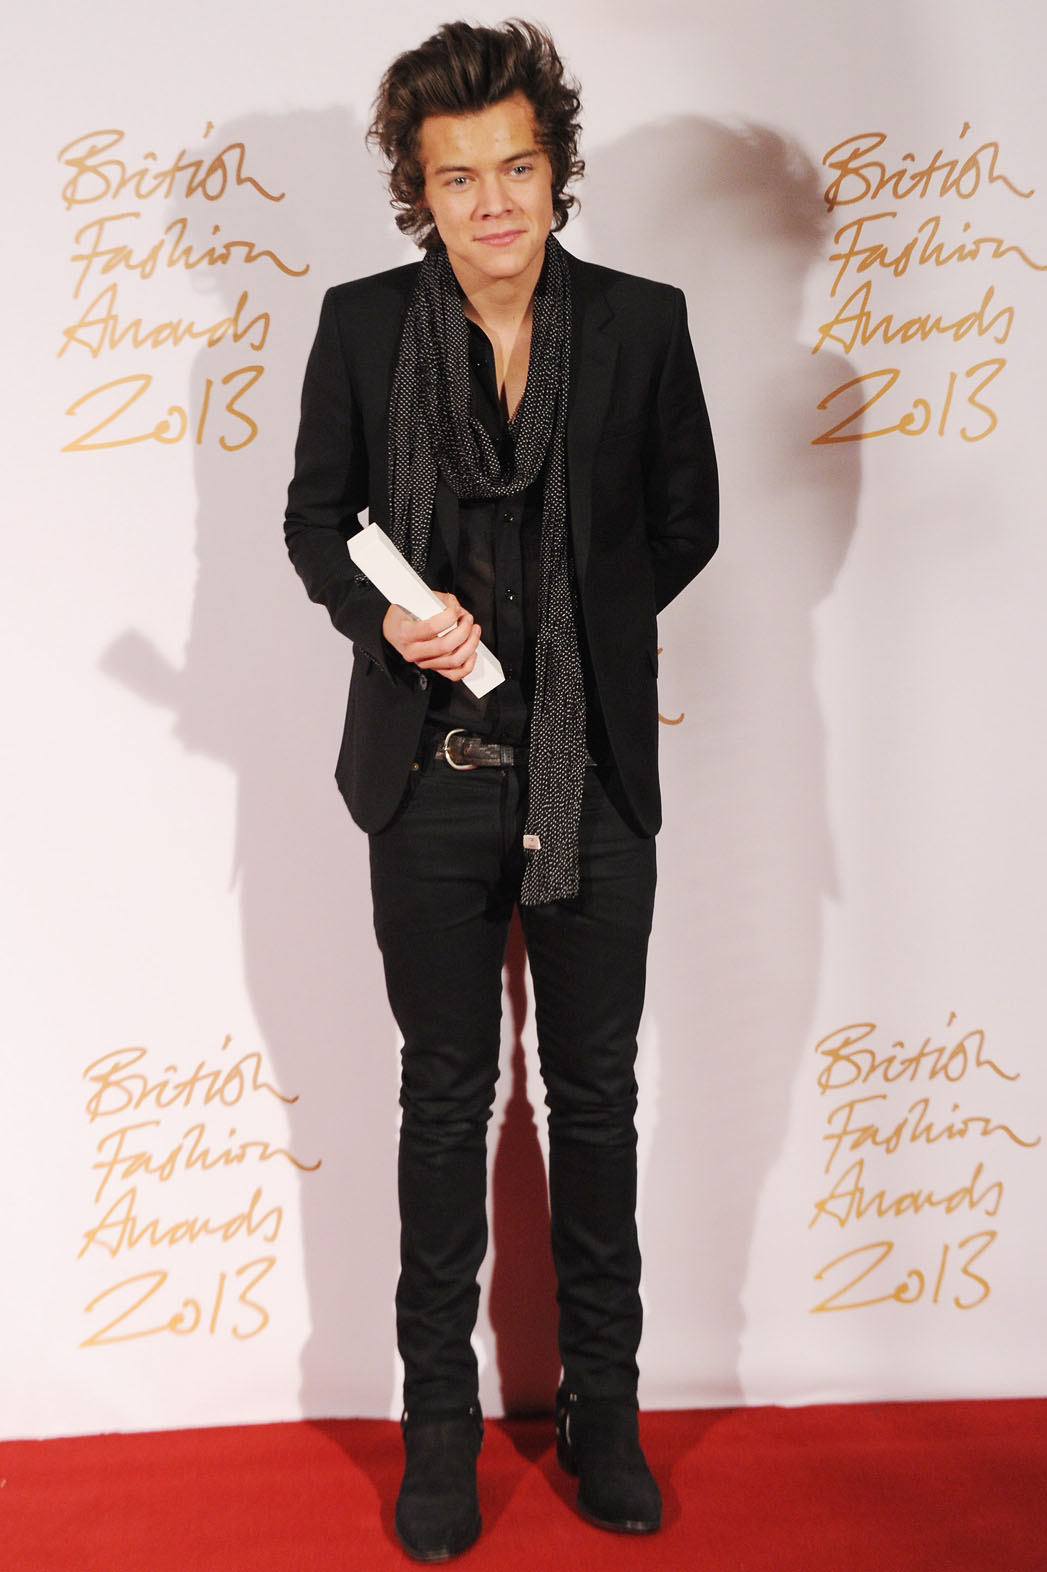 Harry Styles British Fashion Awards - P 2013